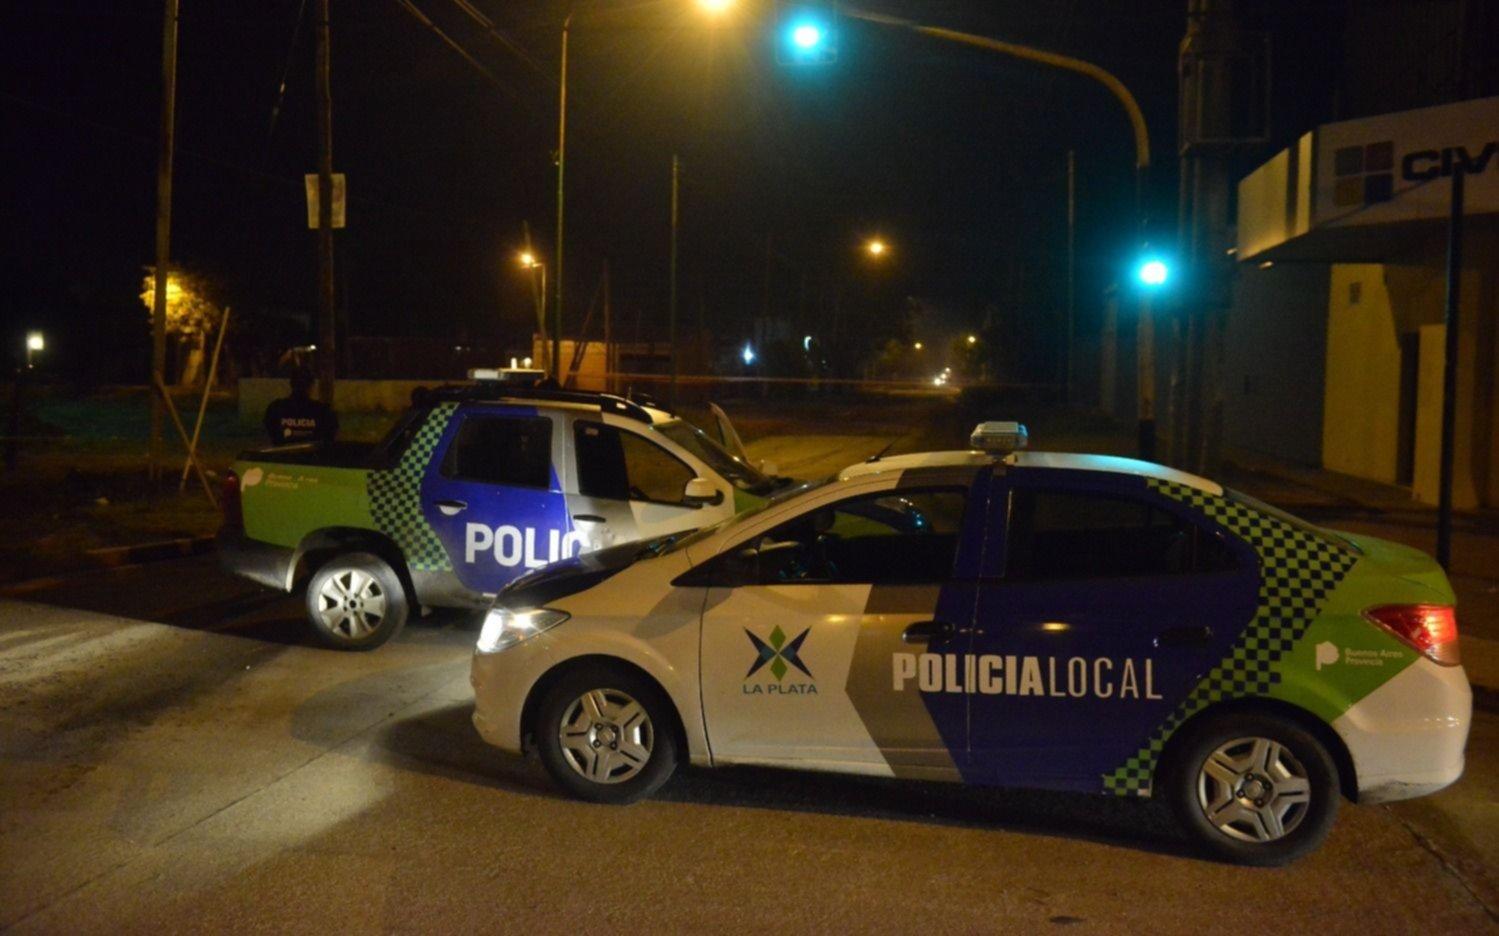 Murió tras ingerir droga en un operativo policial en San Luis